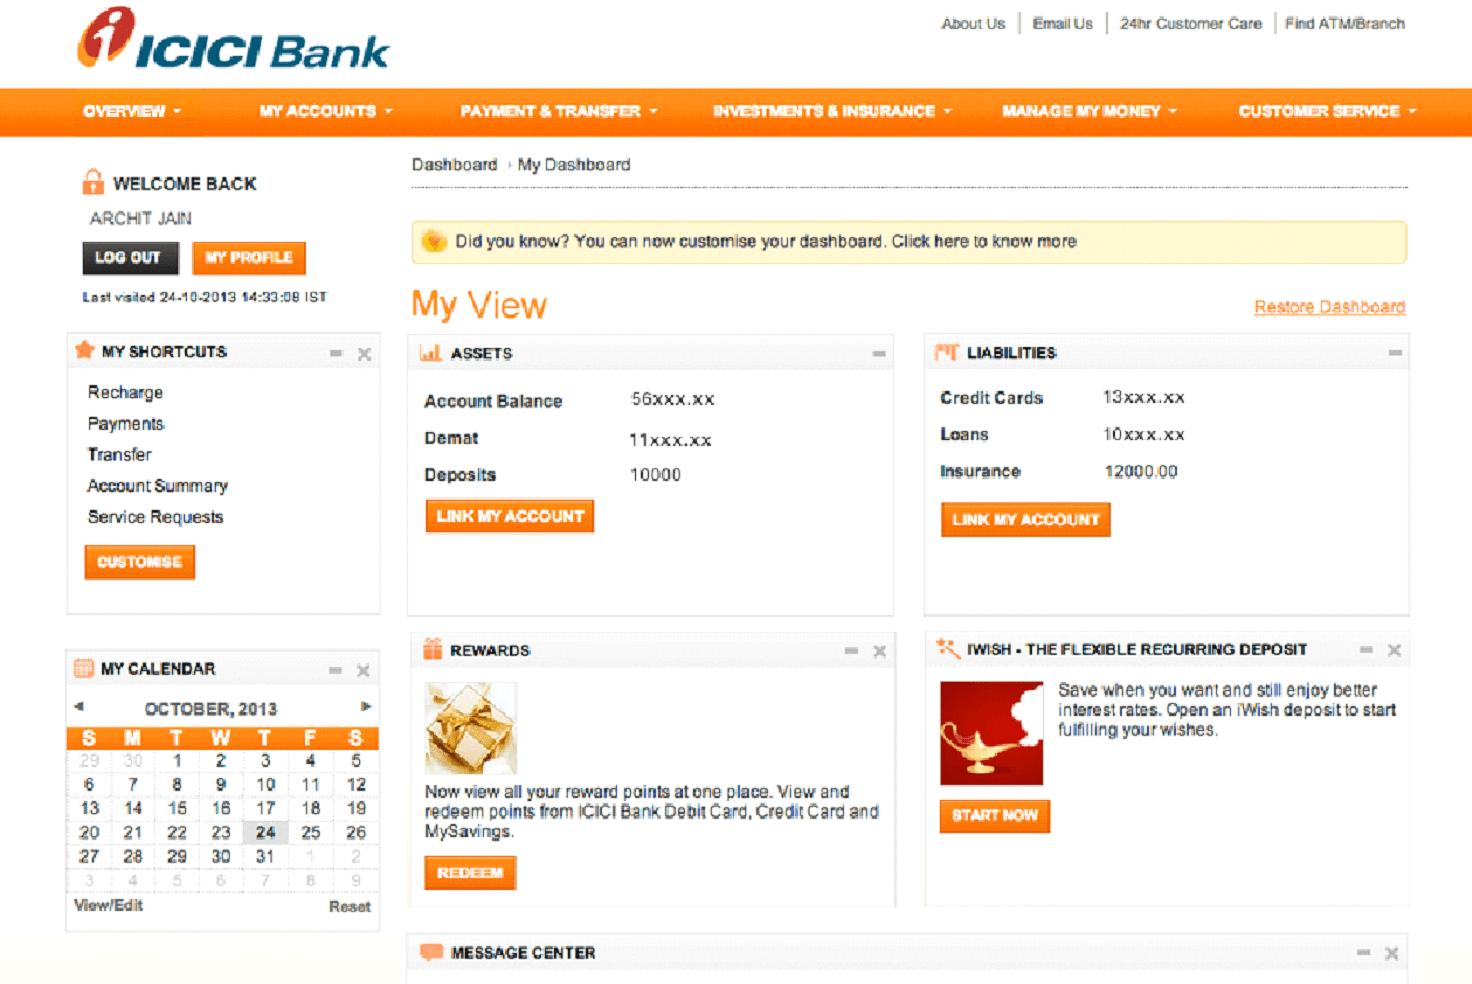 ICICI Bank Profile